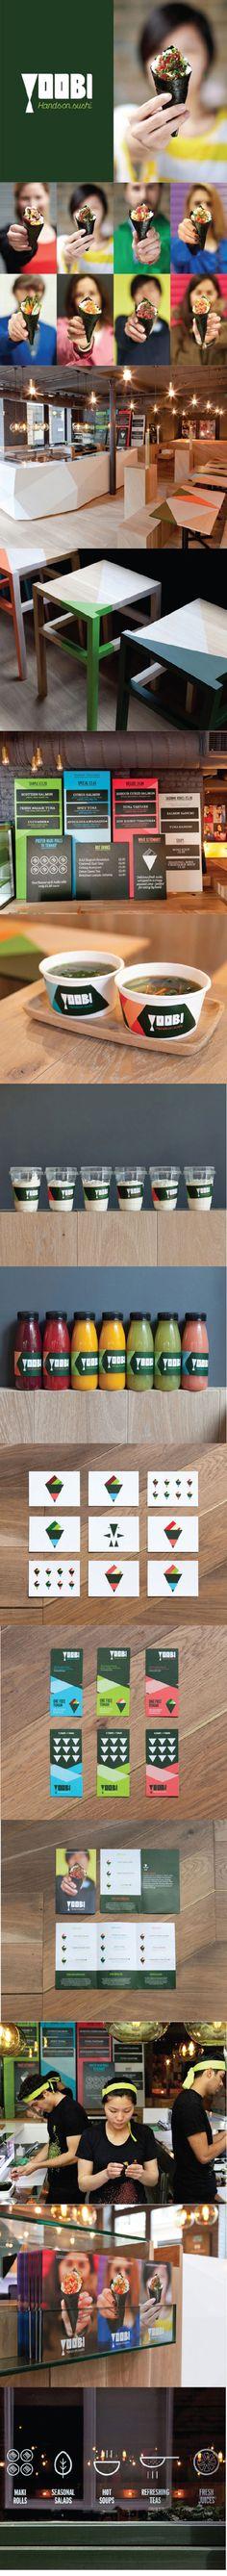 Yoobi | ico design